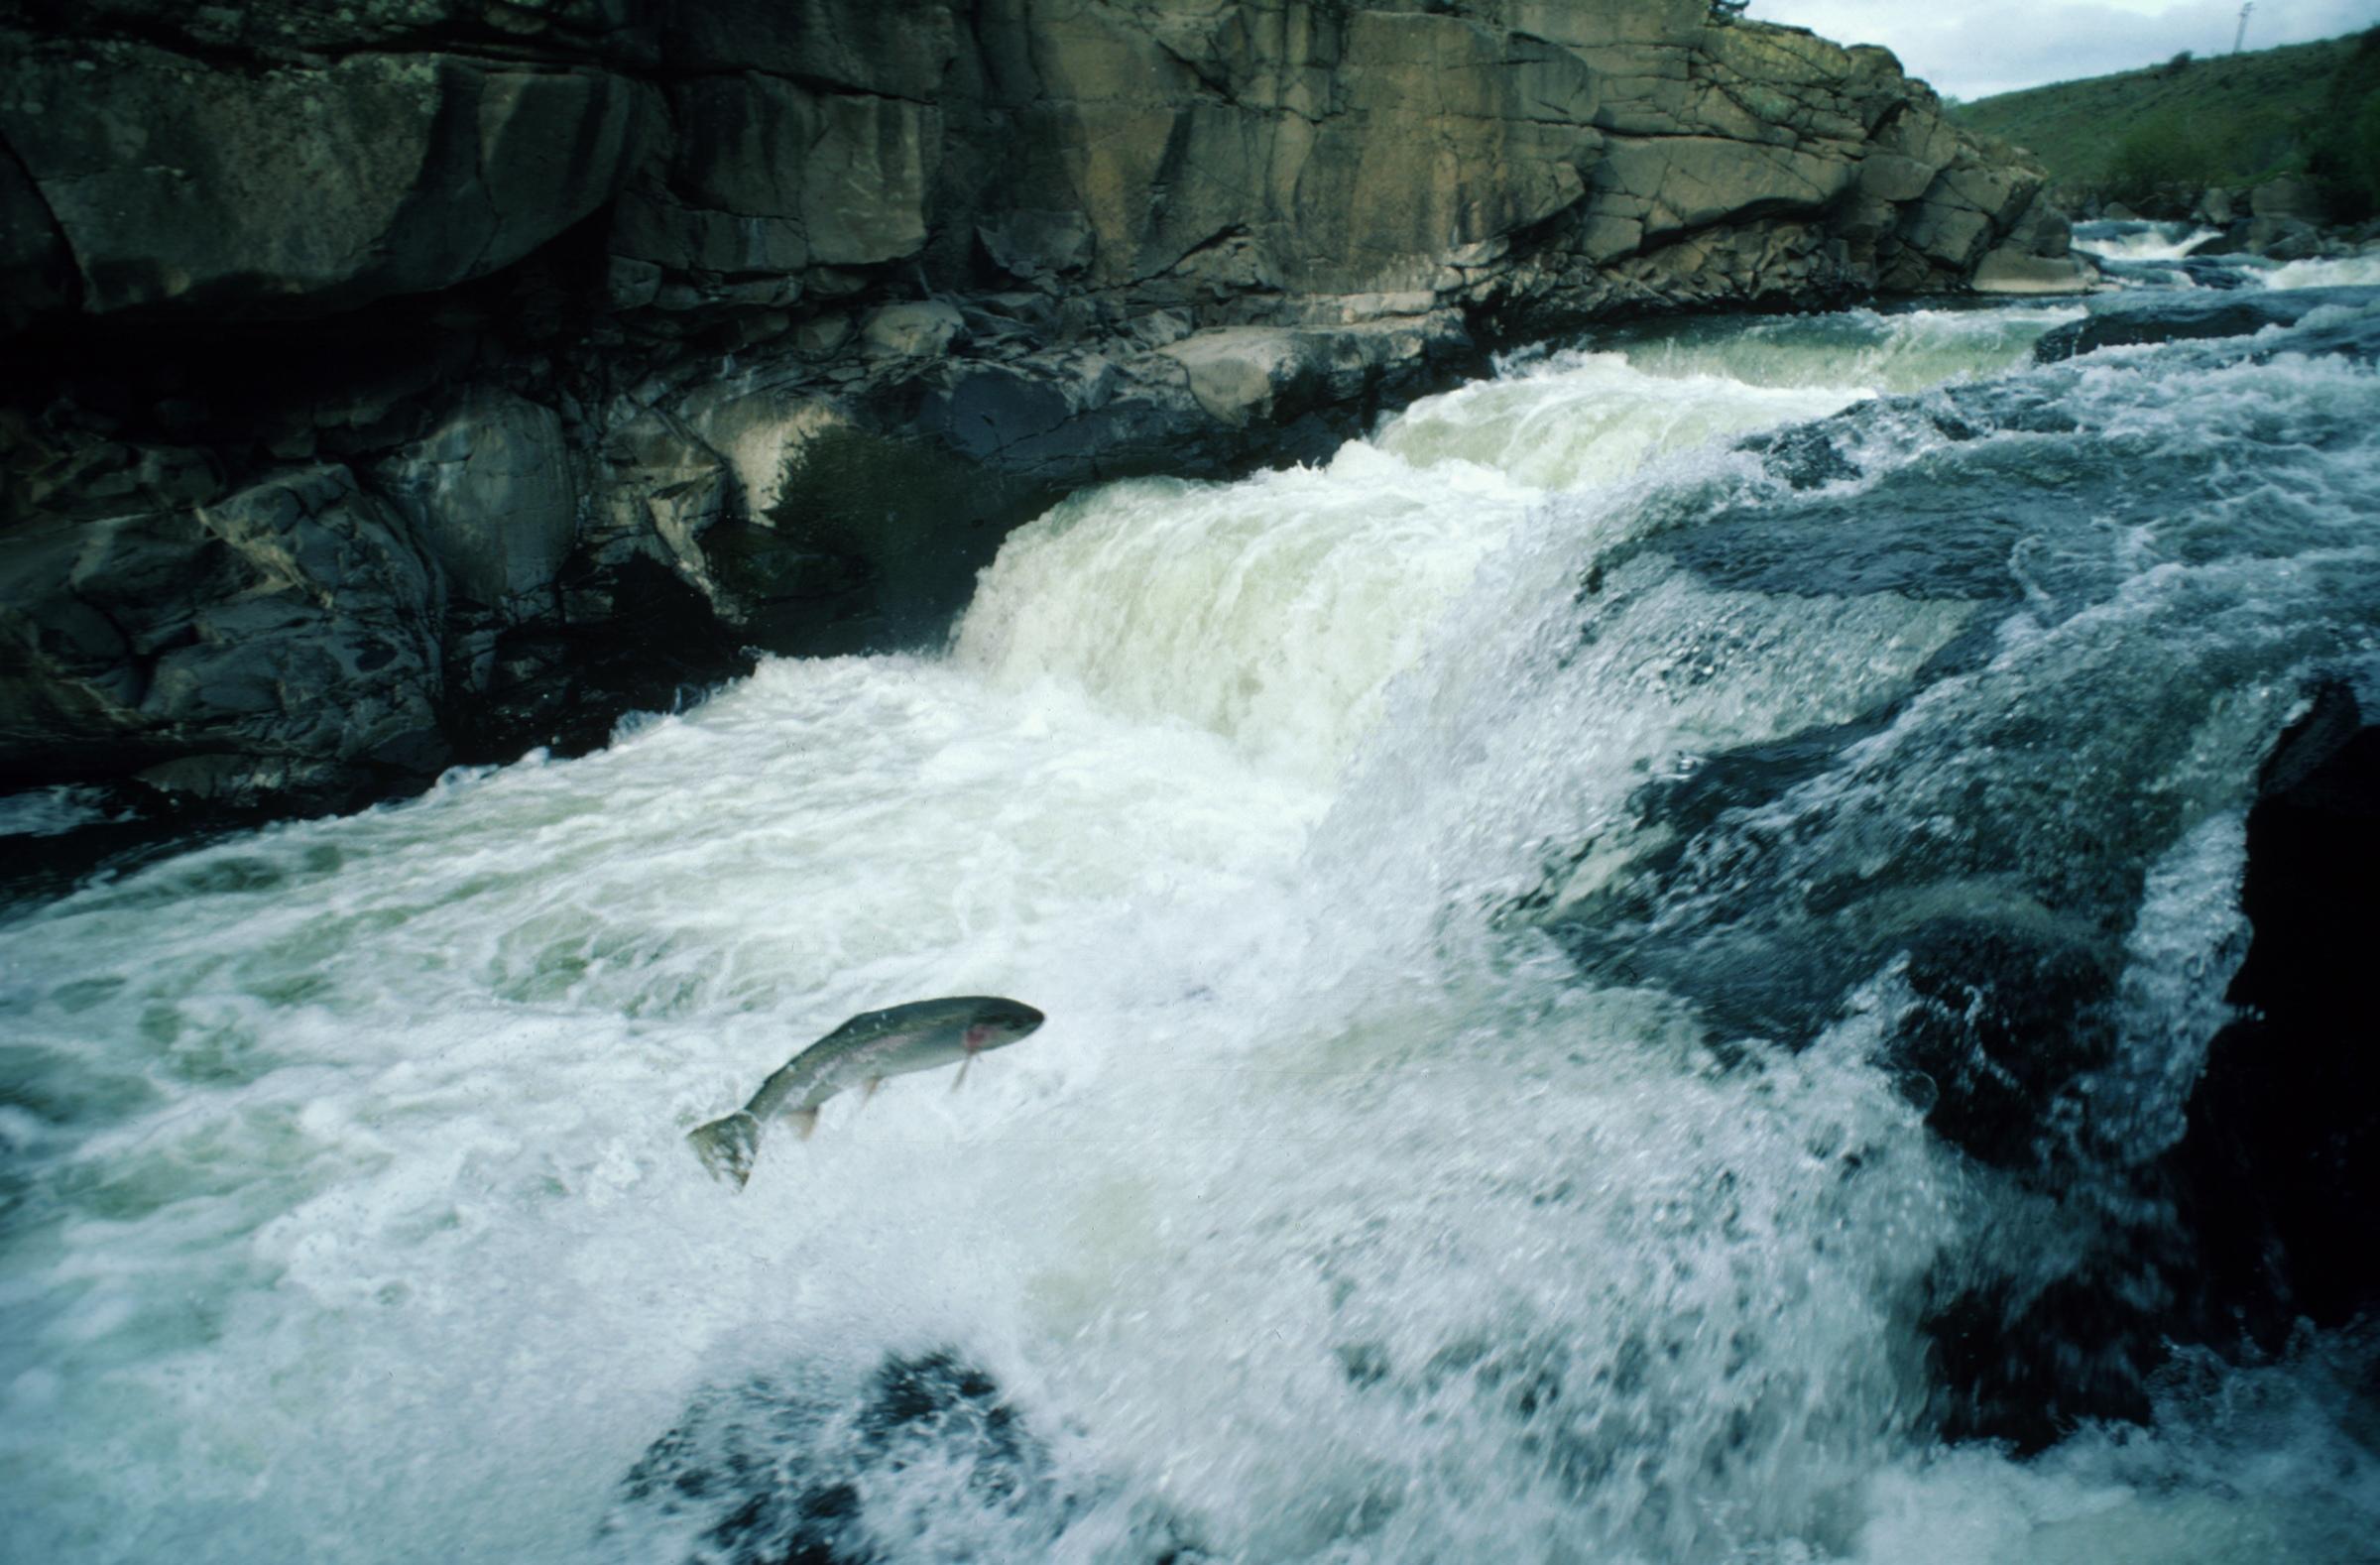 A spawning salmon swims upstream